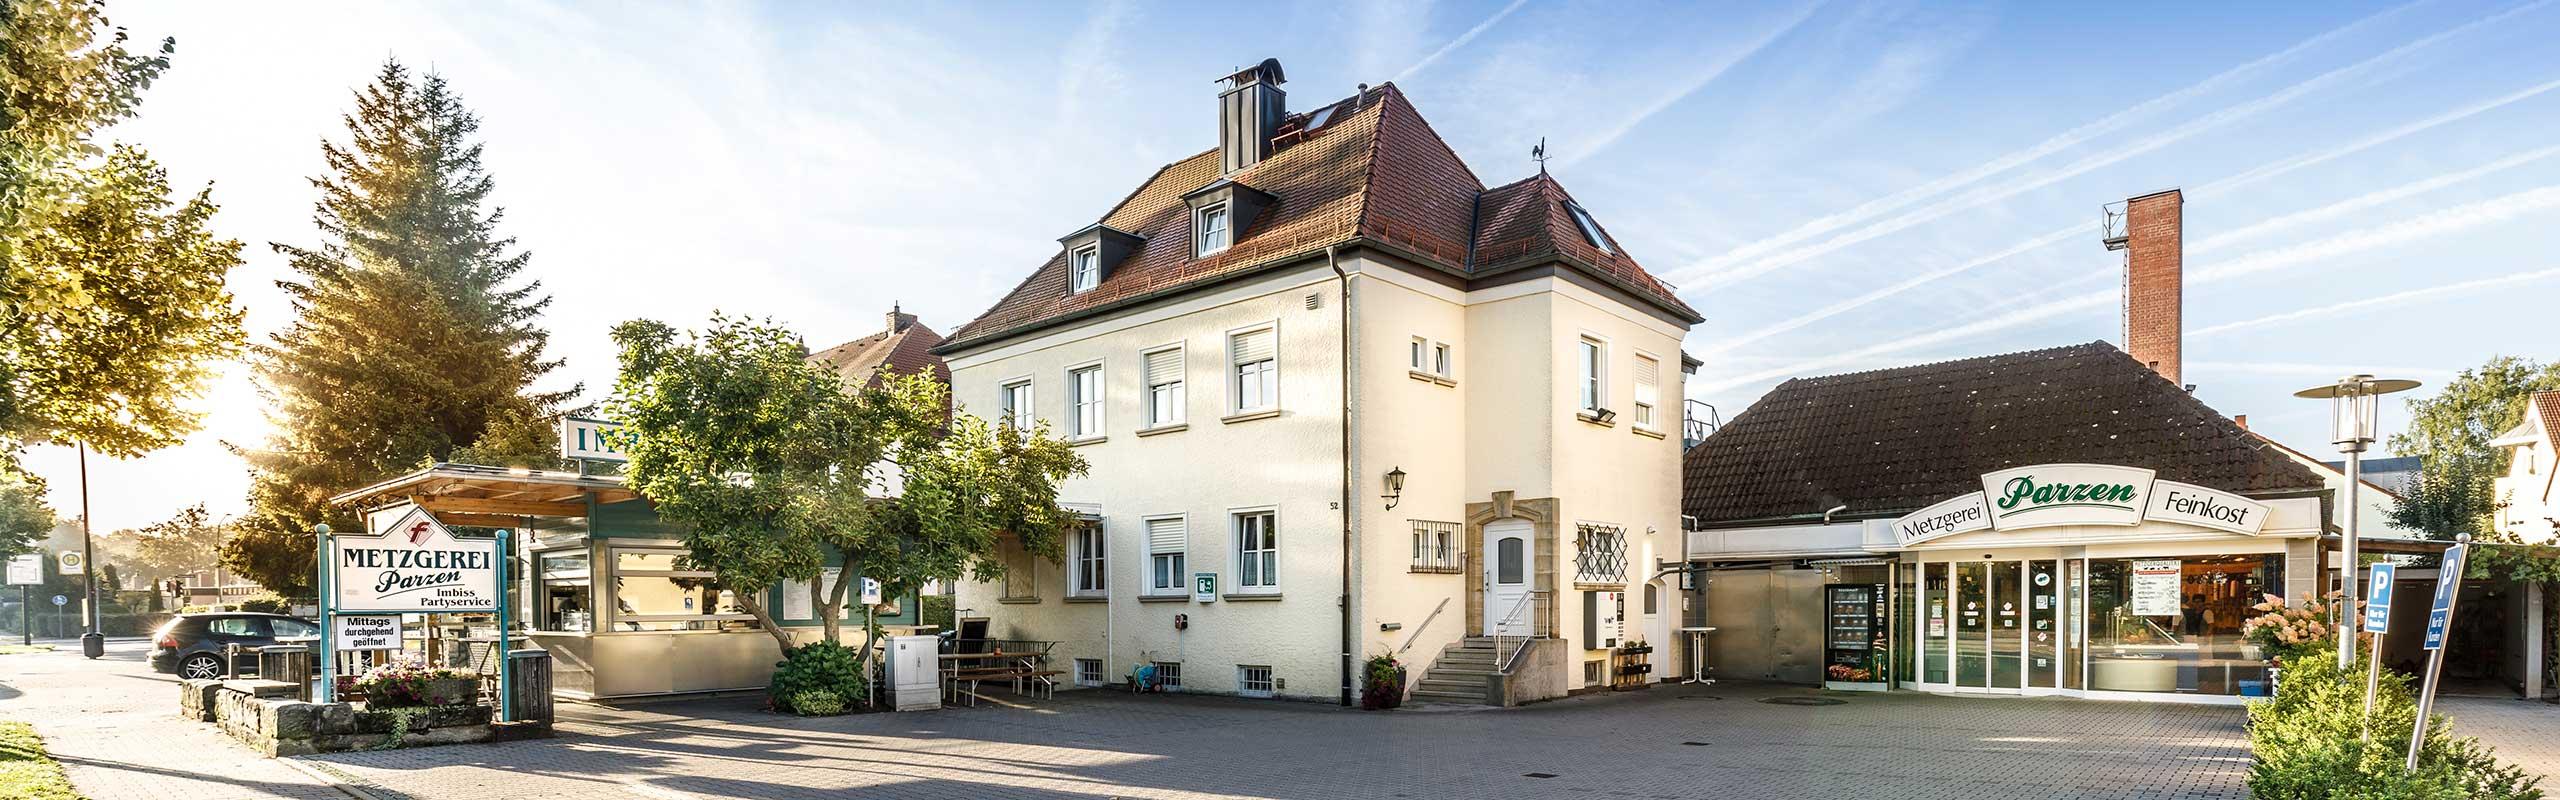 Filialen Metzgerei Parzen Bayreuth